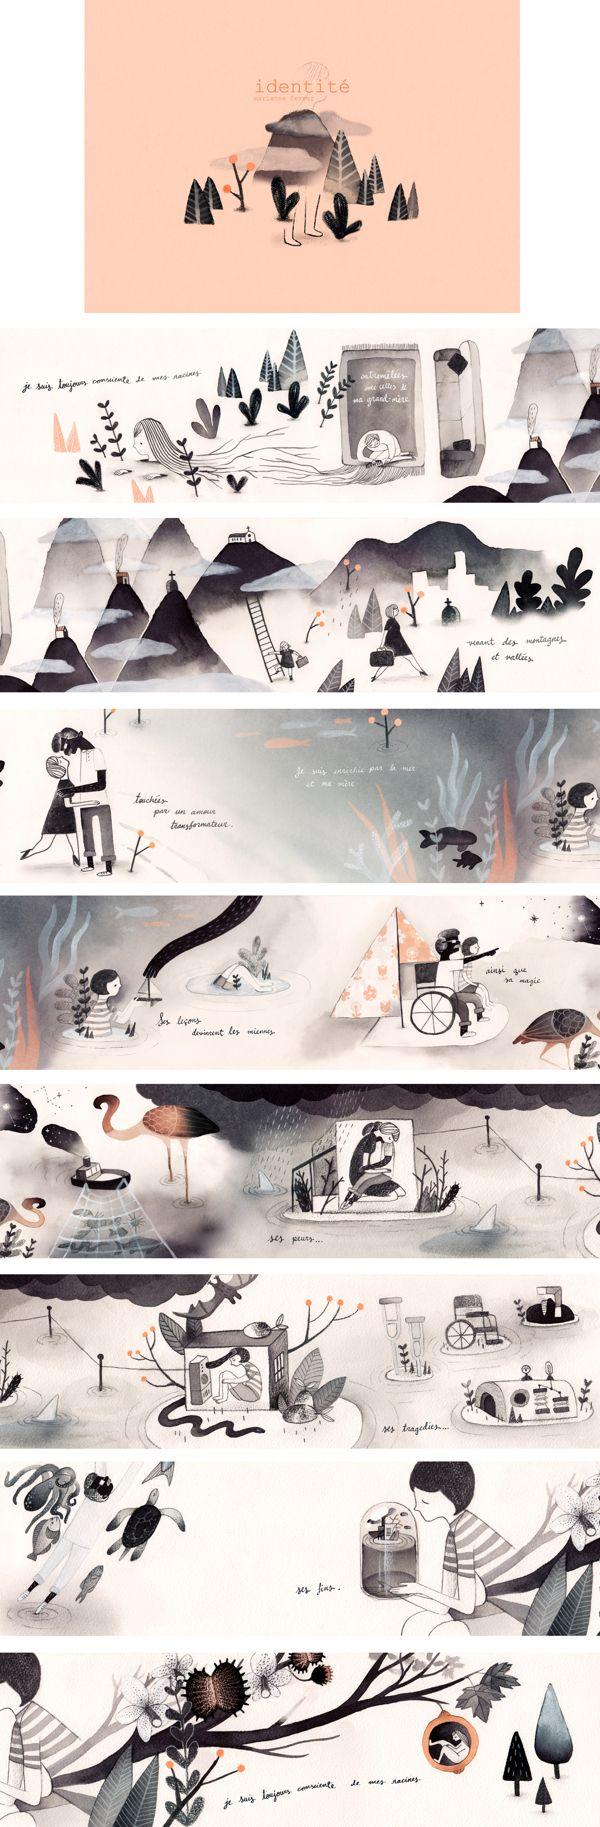 Identité (Identity) by Marianne Ferrer, via Behance